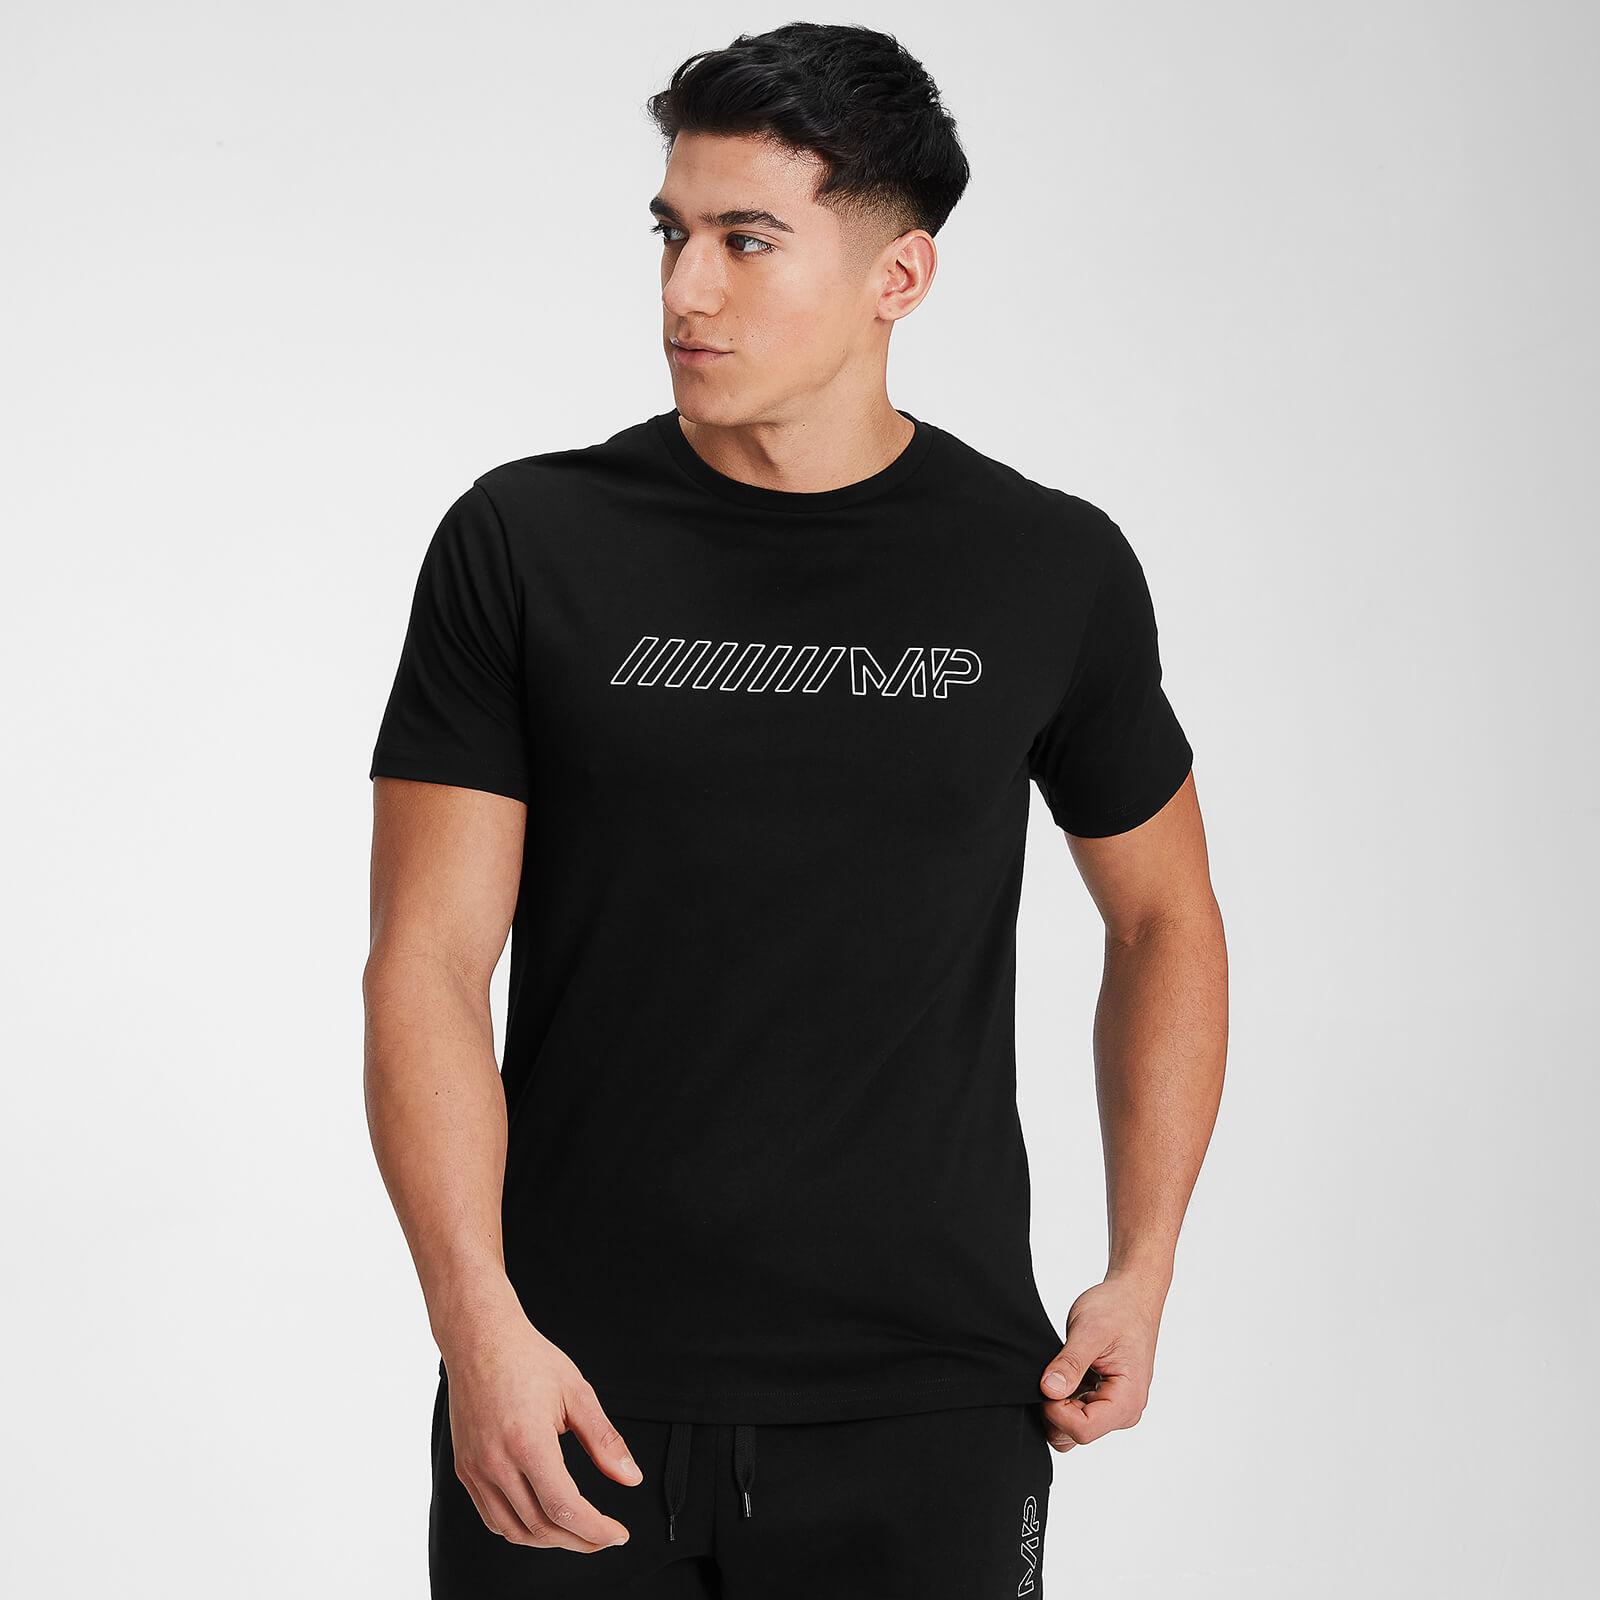 Купить MP Men's Outline Graphic Short Sleeve T-Shirt - Black - S, Myprotein International